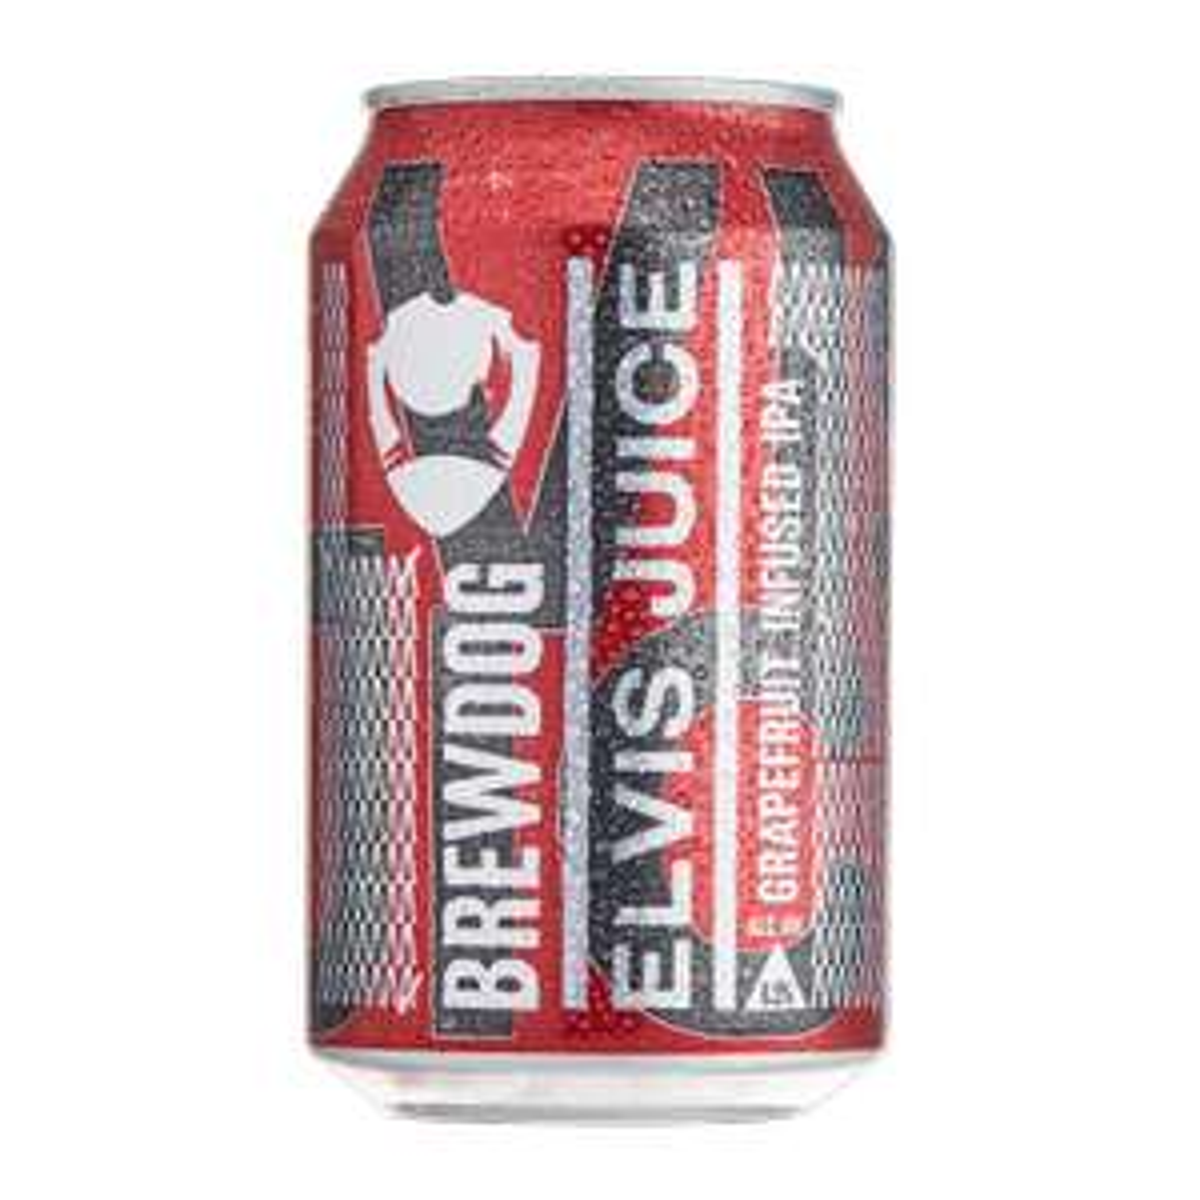 Brewdog Elvis Juice - £1.21 instore @ Sainsbury's